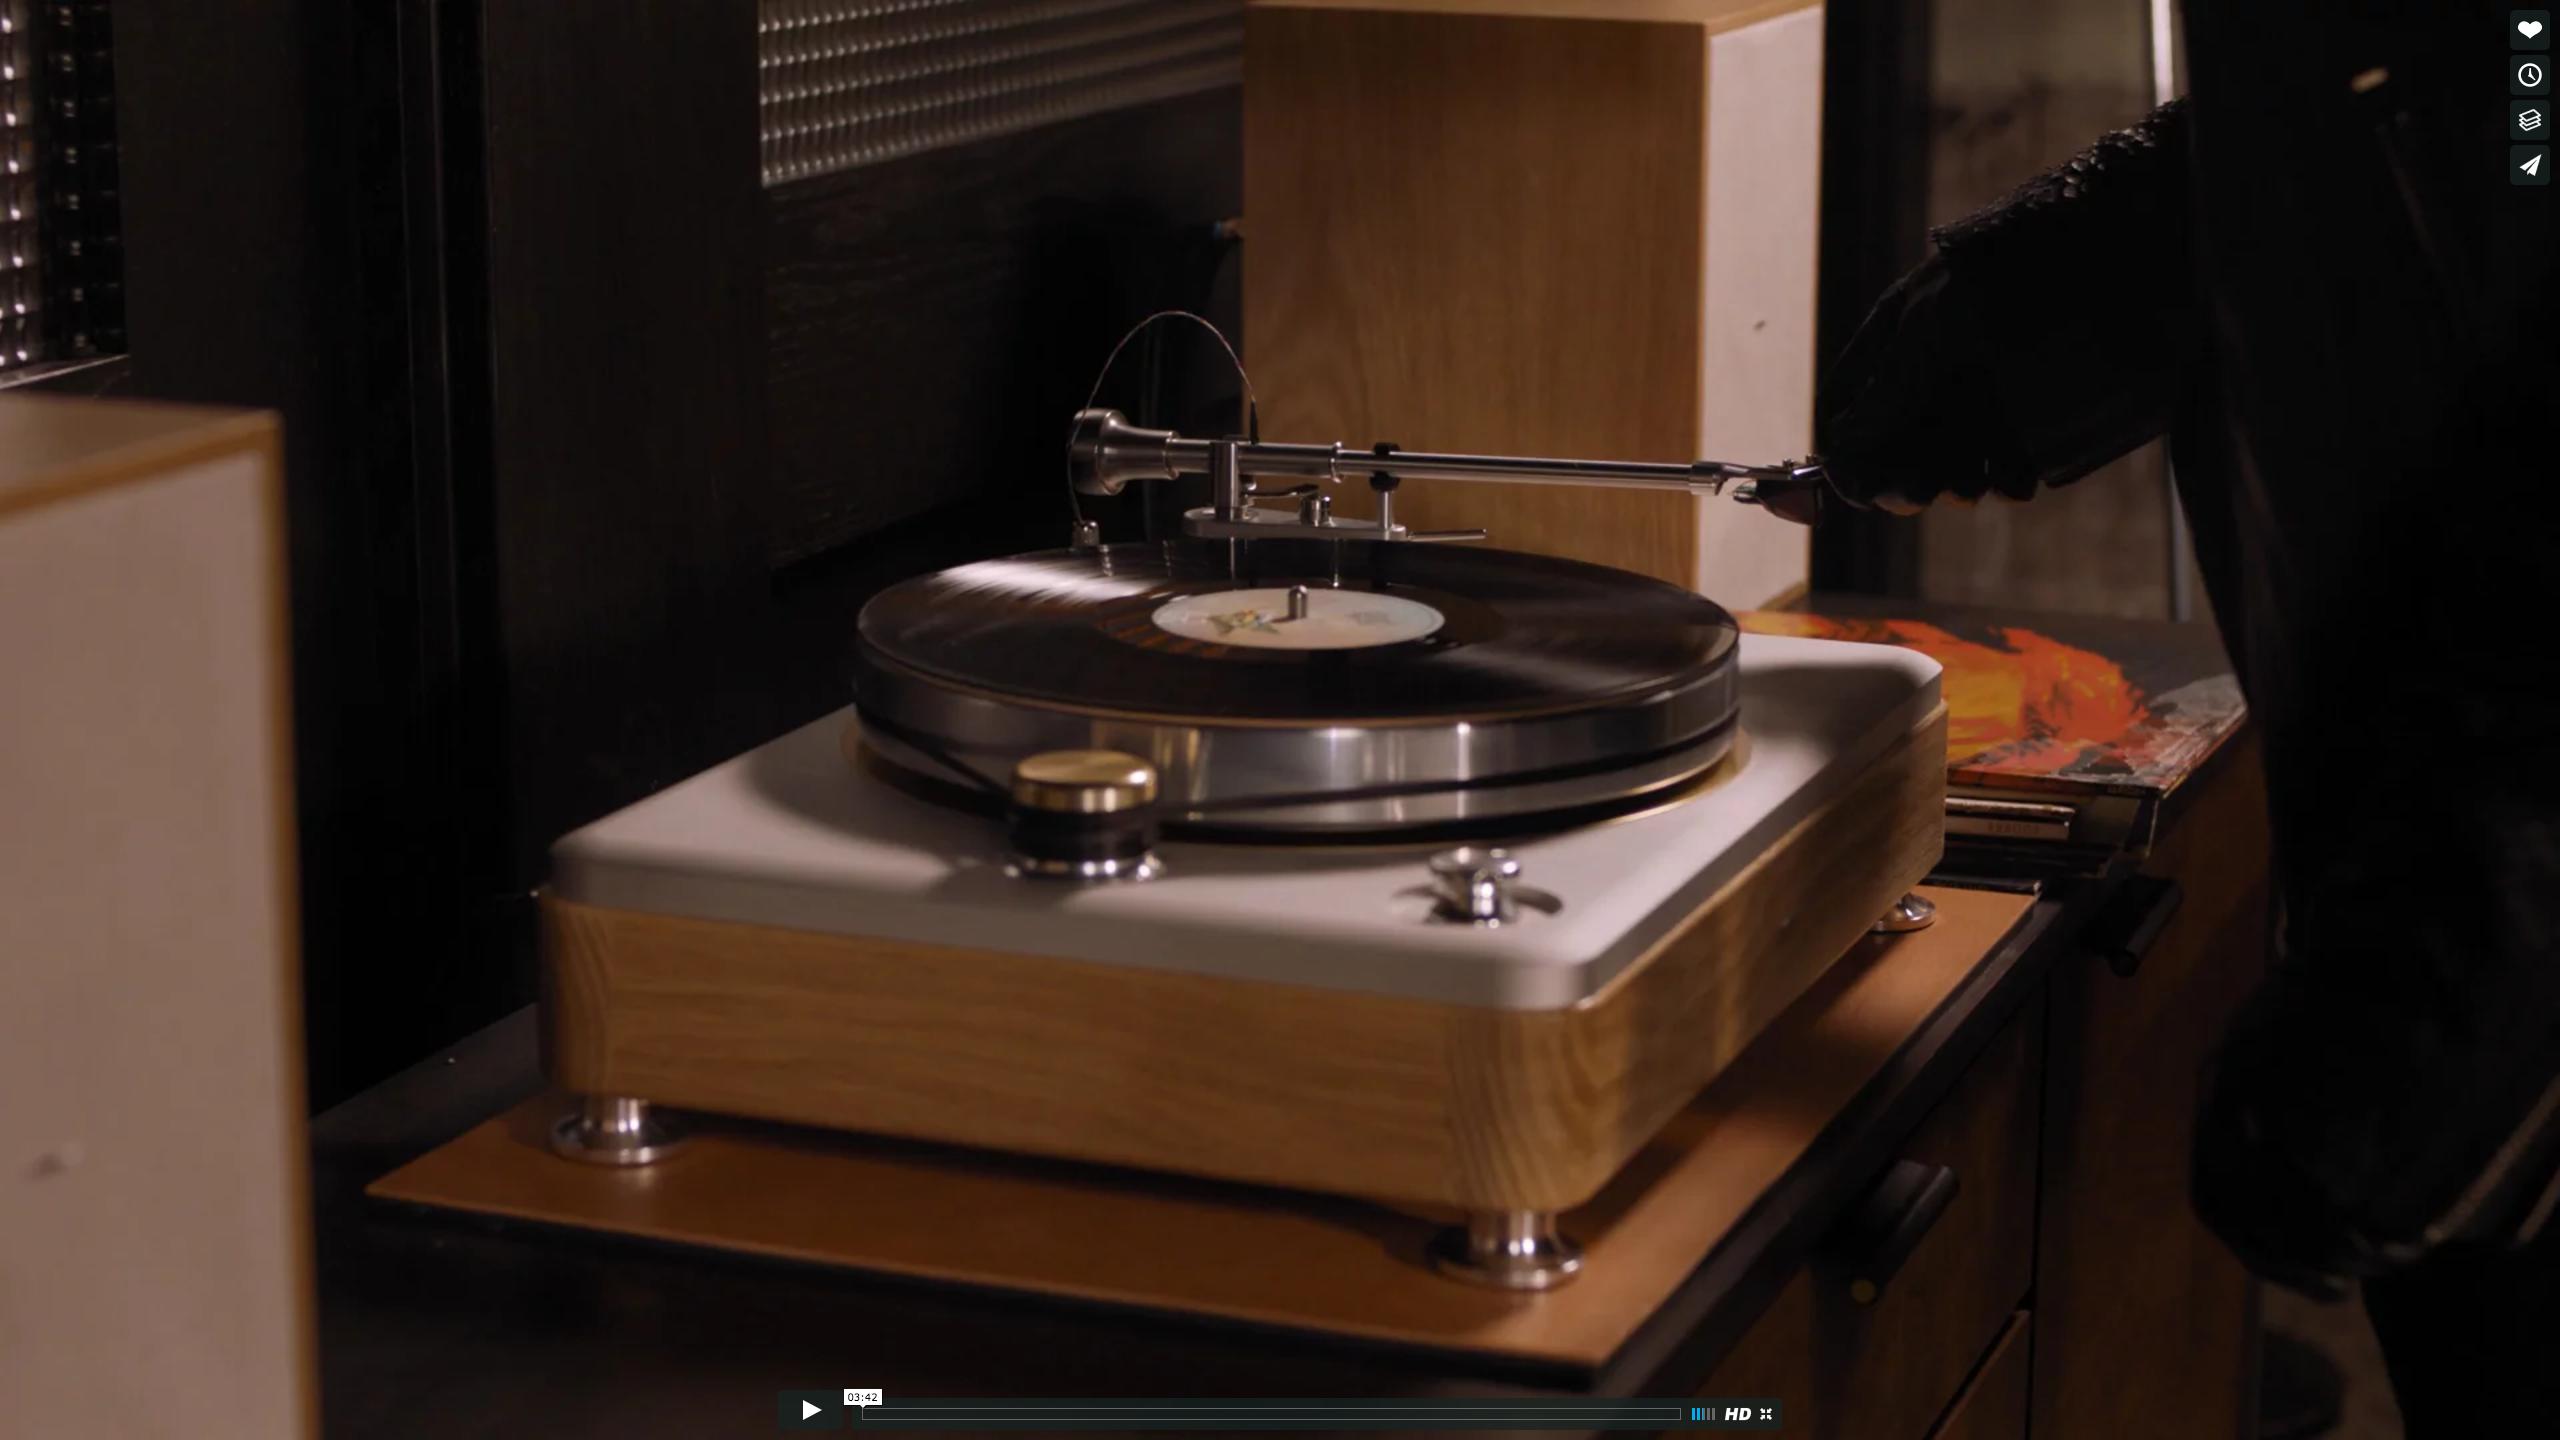 Introducing Shinola Audio: The Runwell Turntable on Vimeo 2016-12-08 22-11-57.png